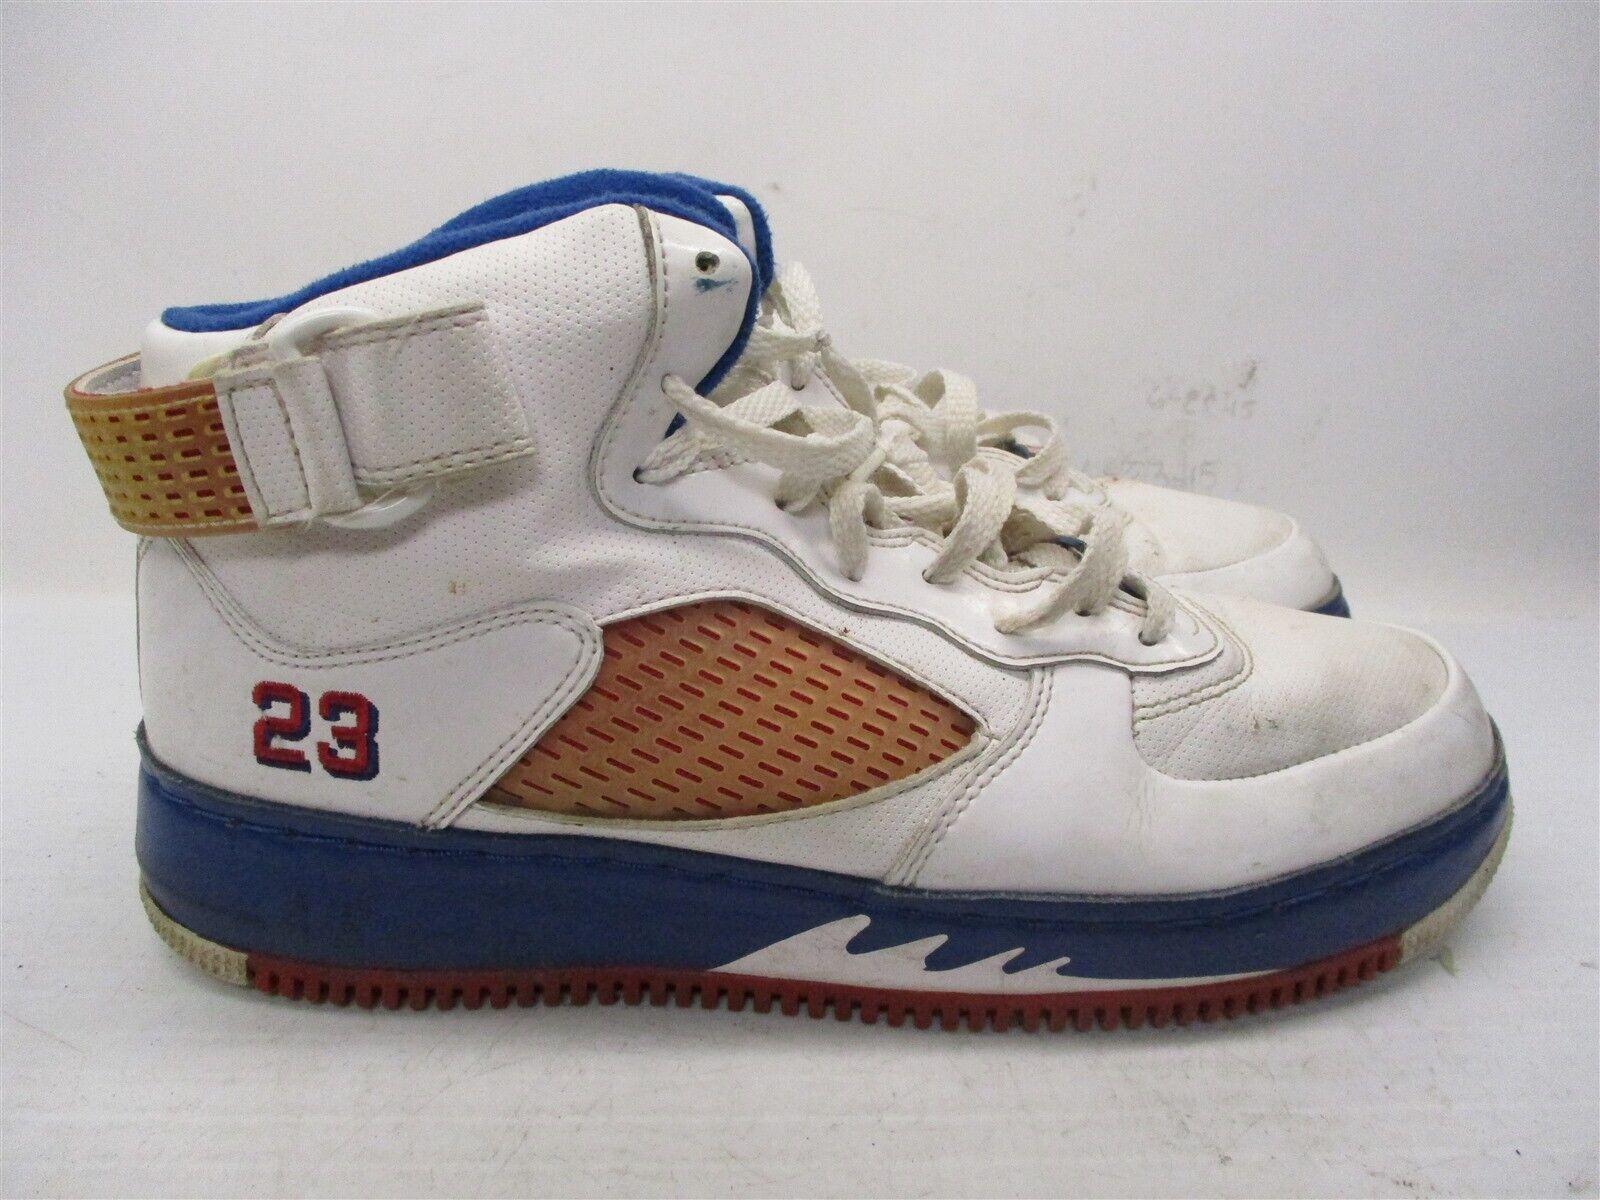 buy popular dd4d5 4d09b JORDAN Sneakers Men's Size 10 NIKE AIR 23 Basketball 2008 ...